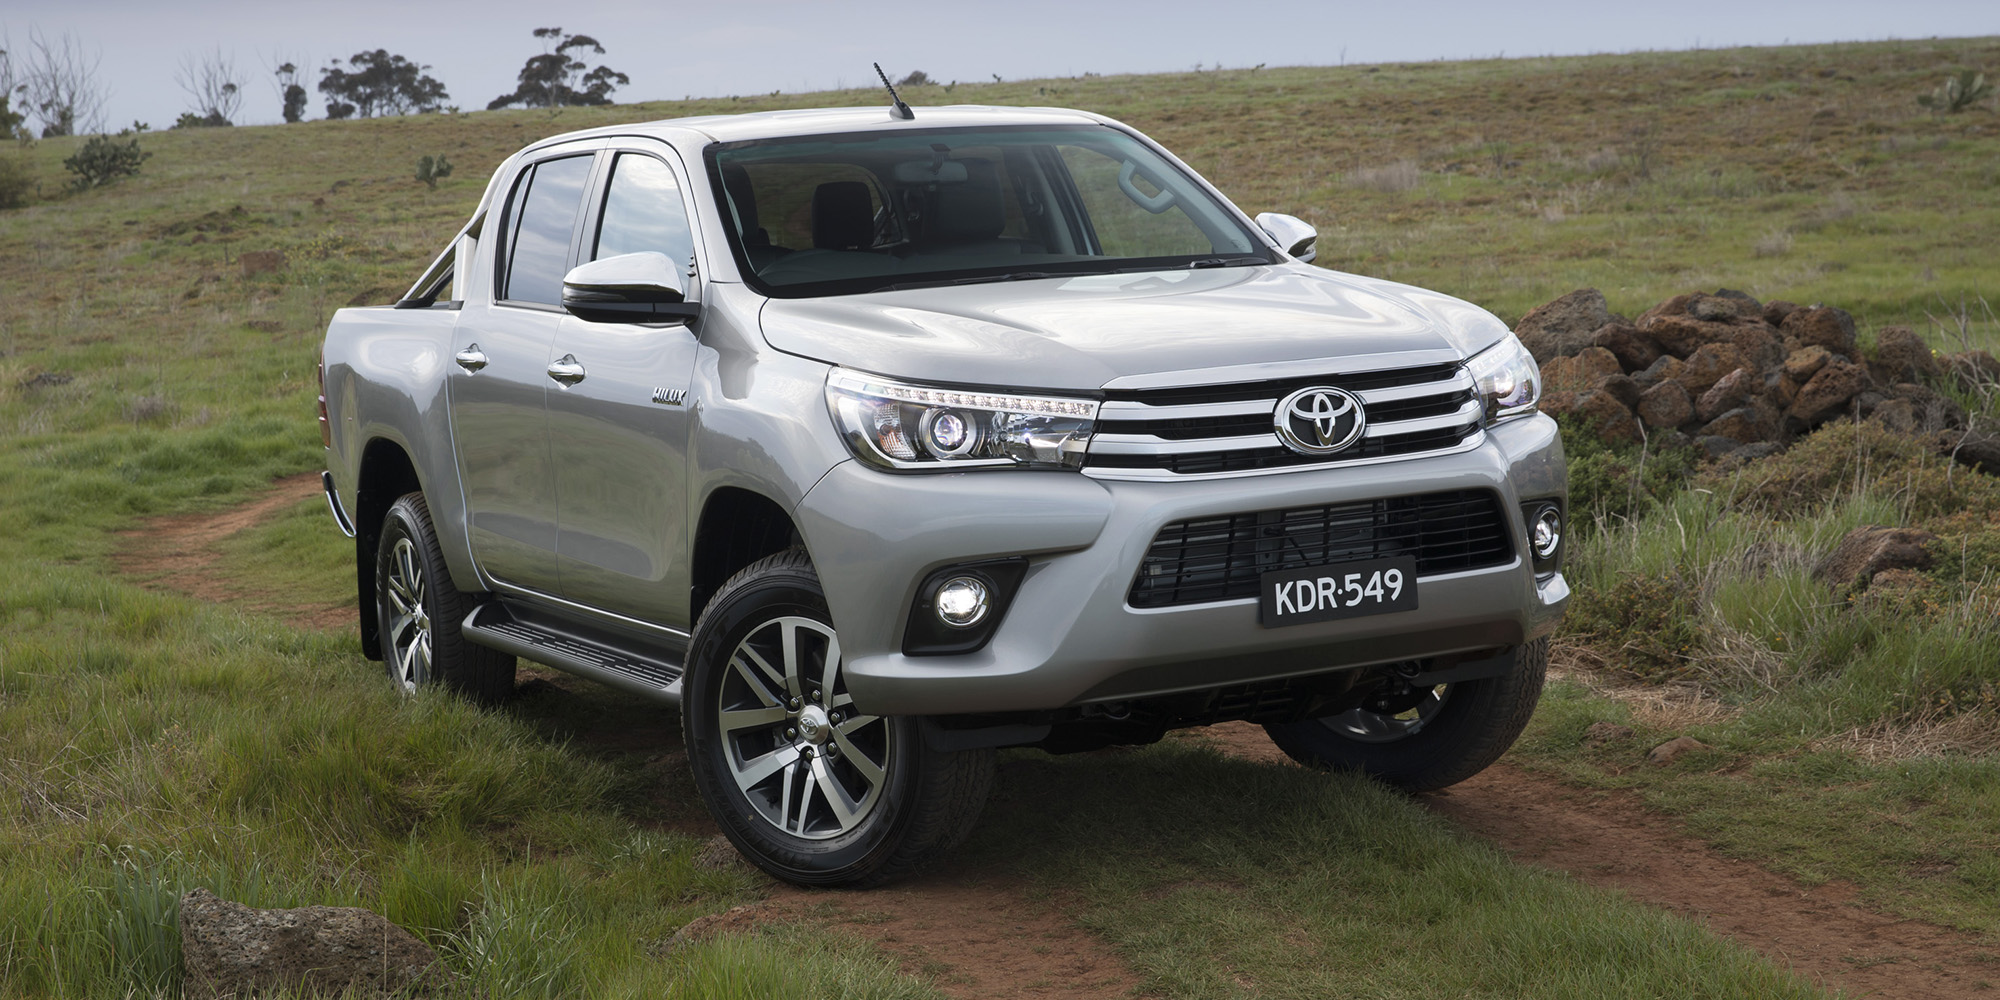 Kekurangan Toyota Hilux 2018 Review